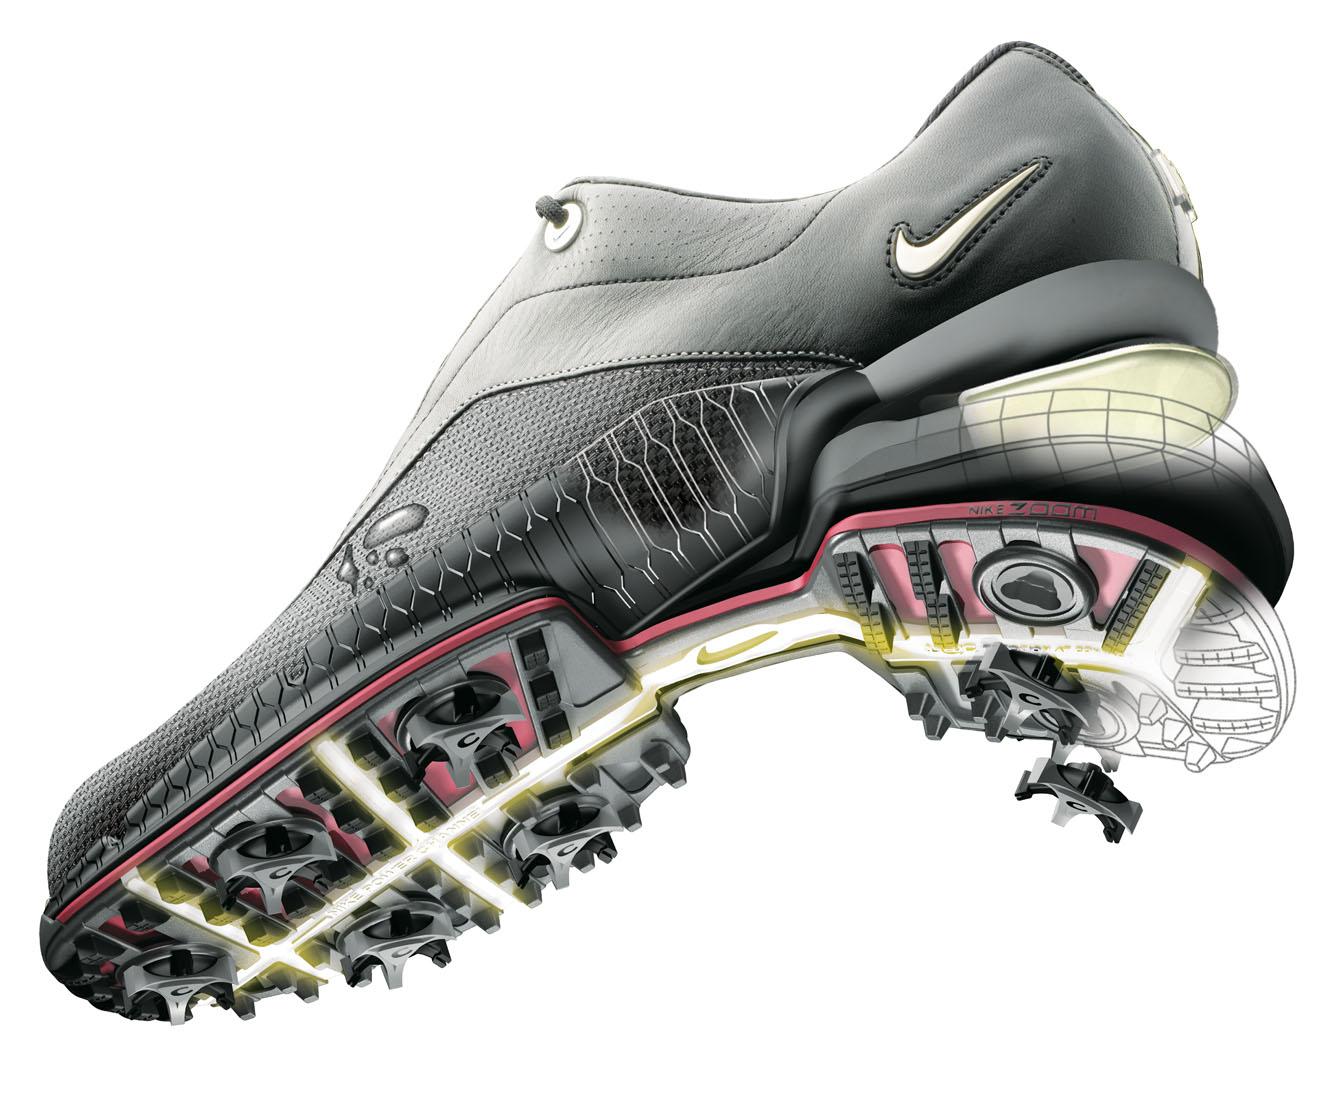 NikeAirZoomTW9.jpg